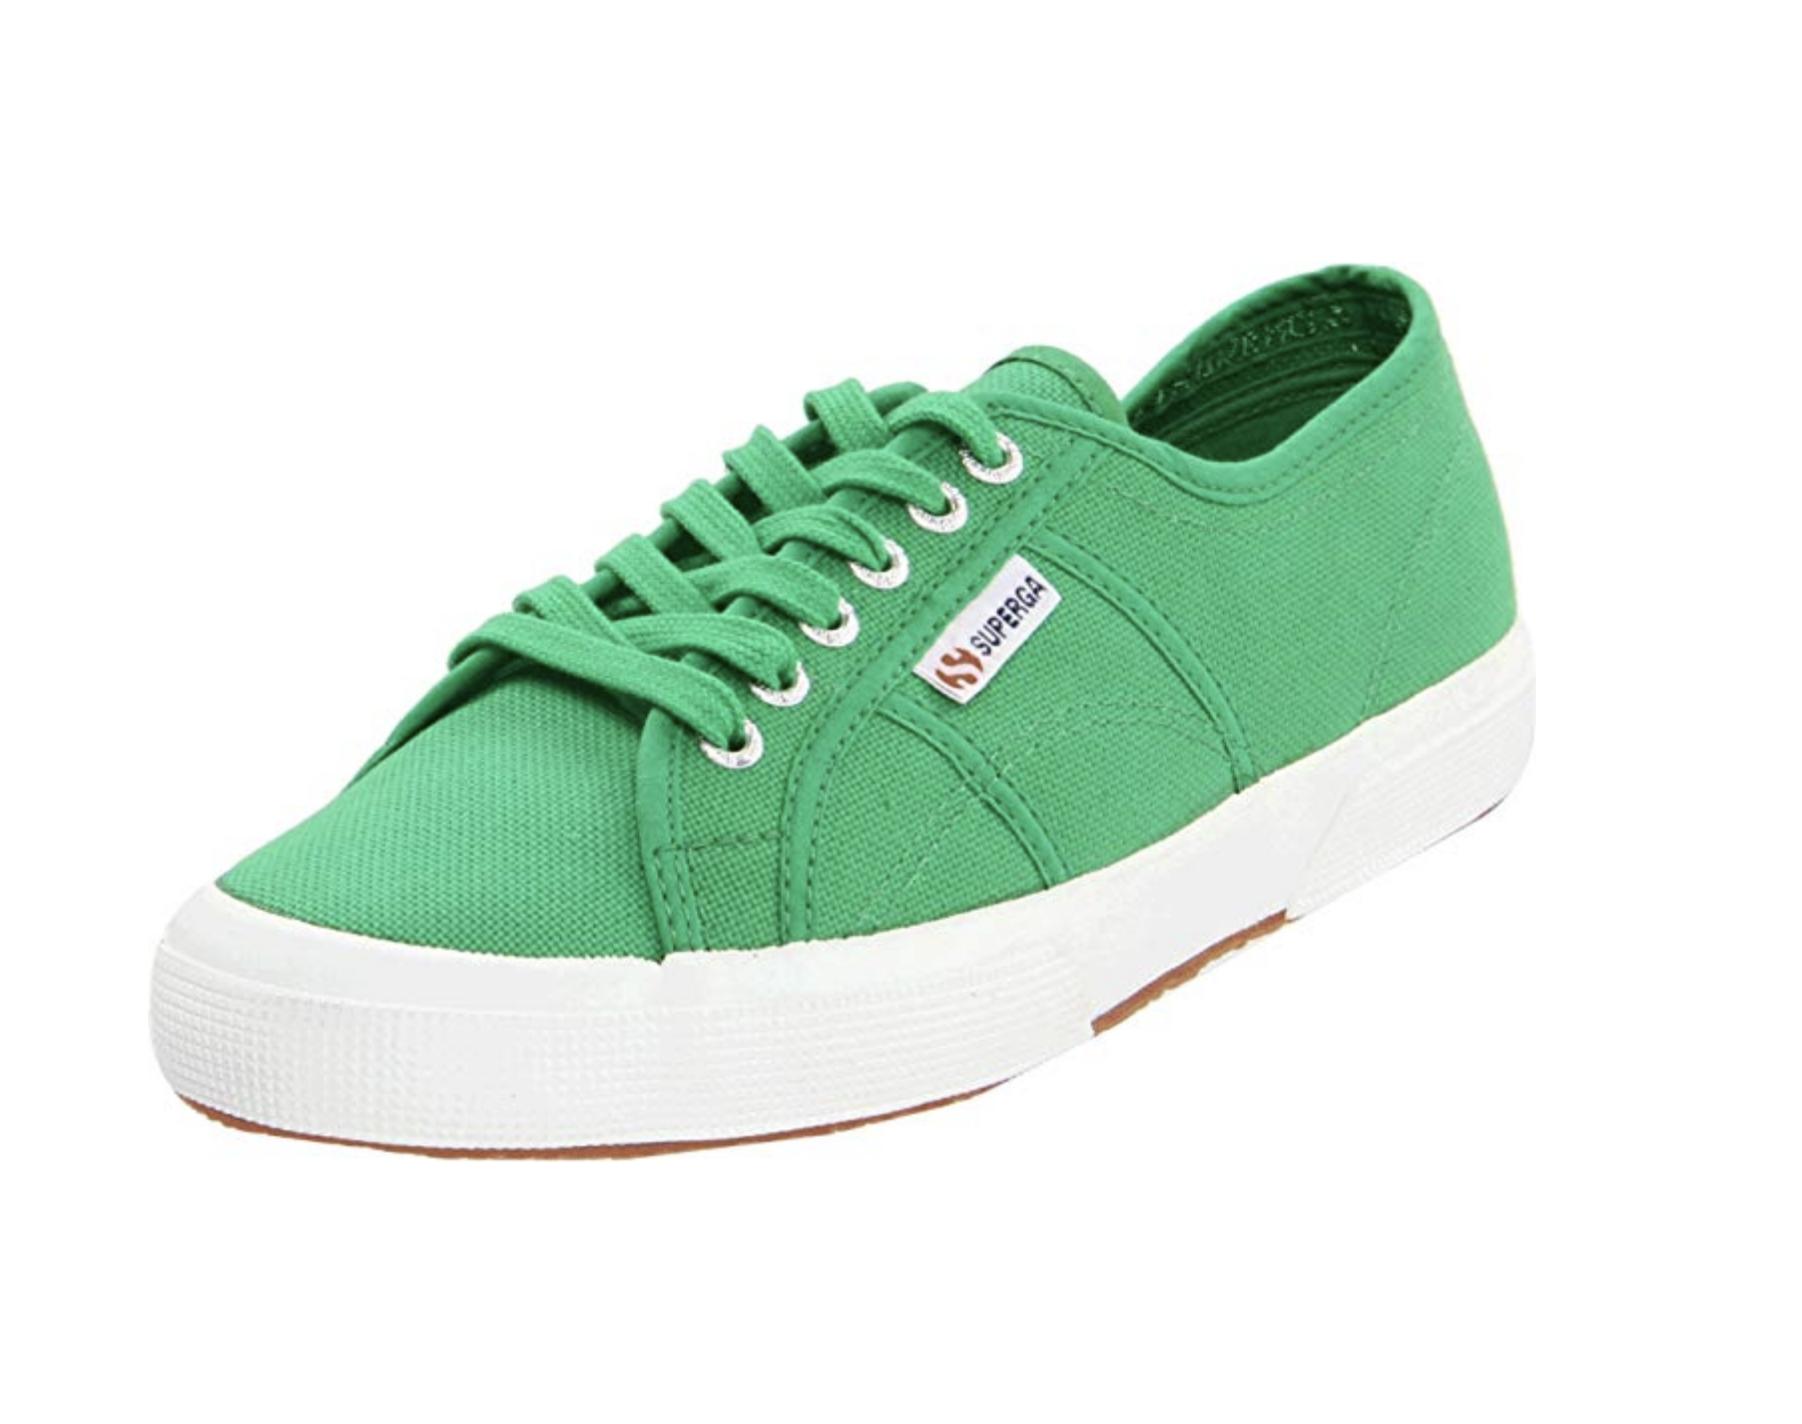 2750 Cotu Classic Sneakers in Green